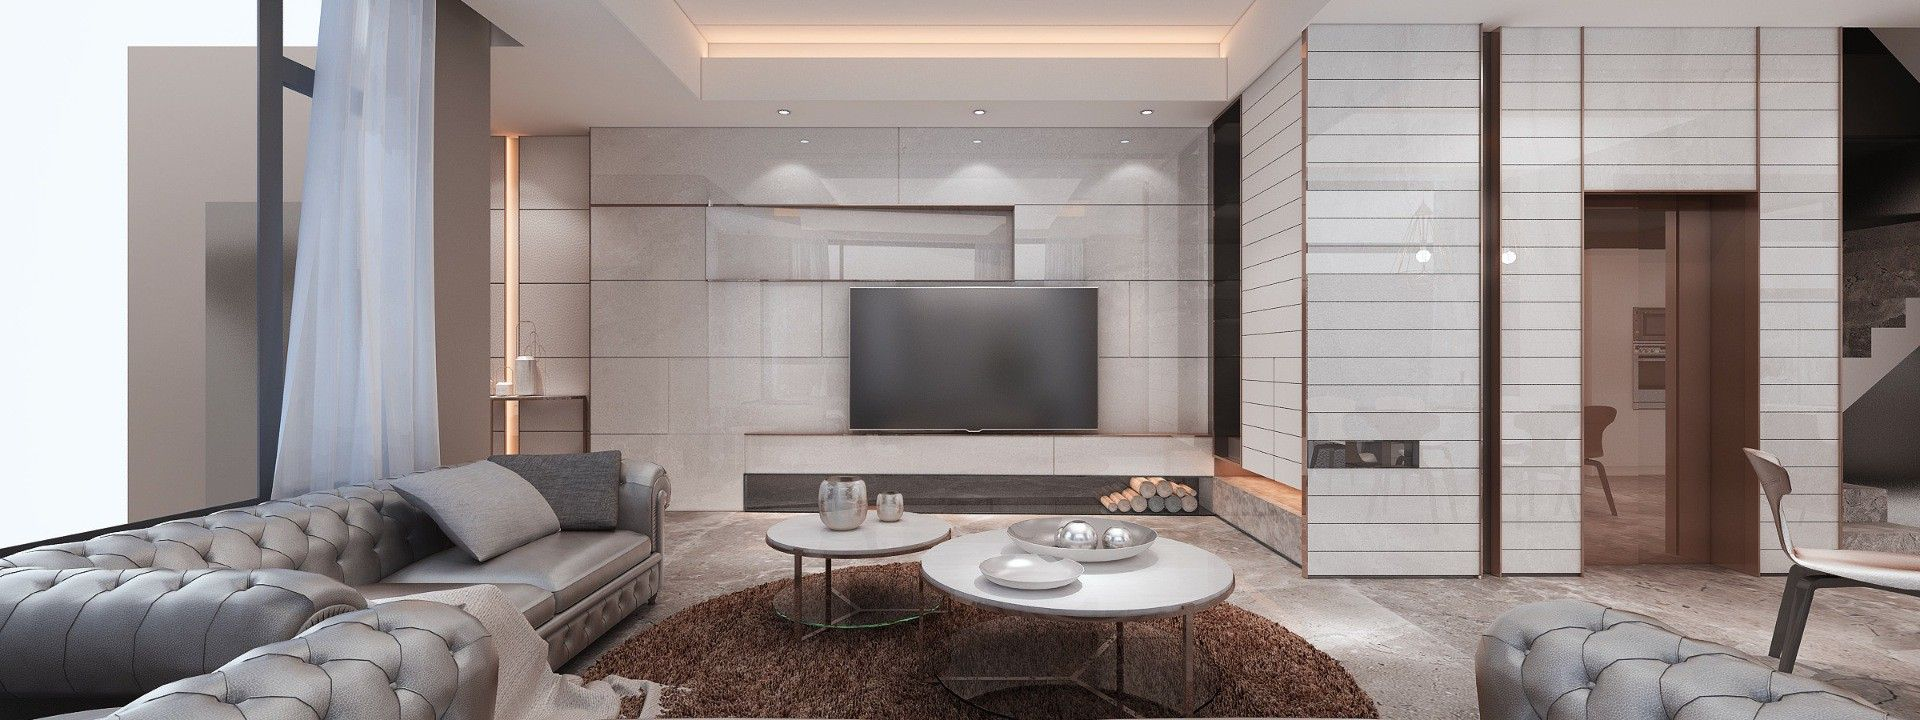 Design small spaces residential interior design hong kong interior designer find the best freelance interior designers expertise in small space design